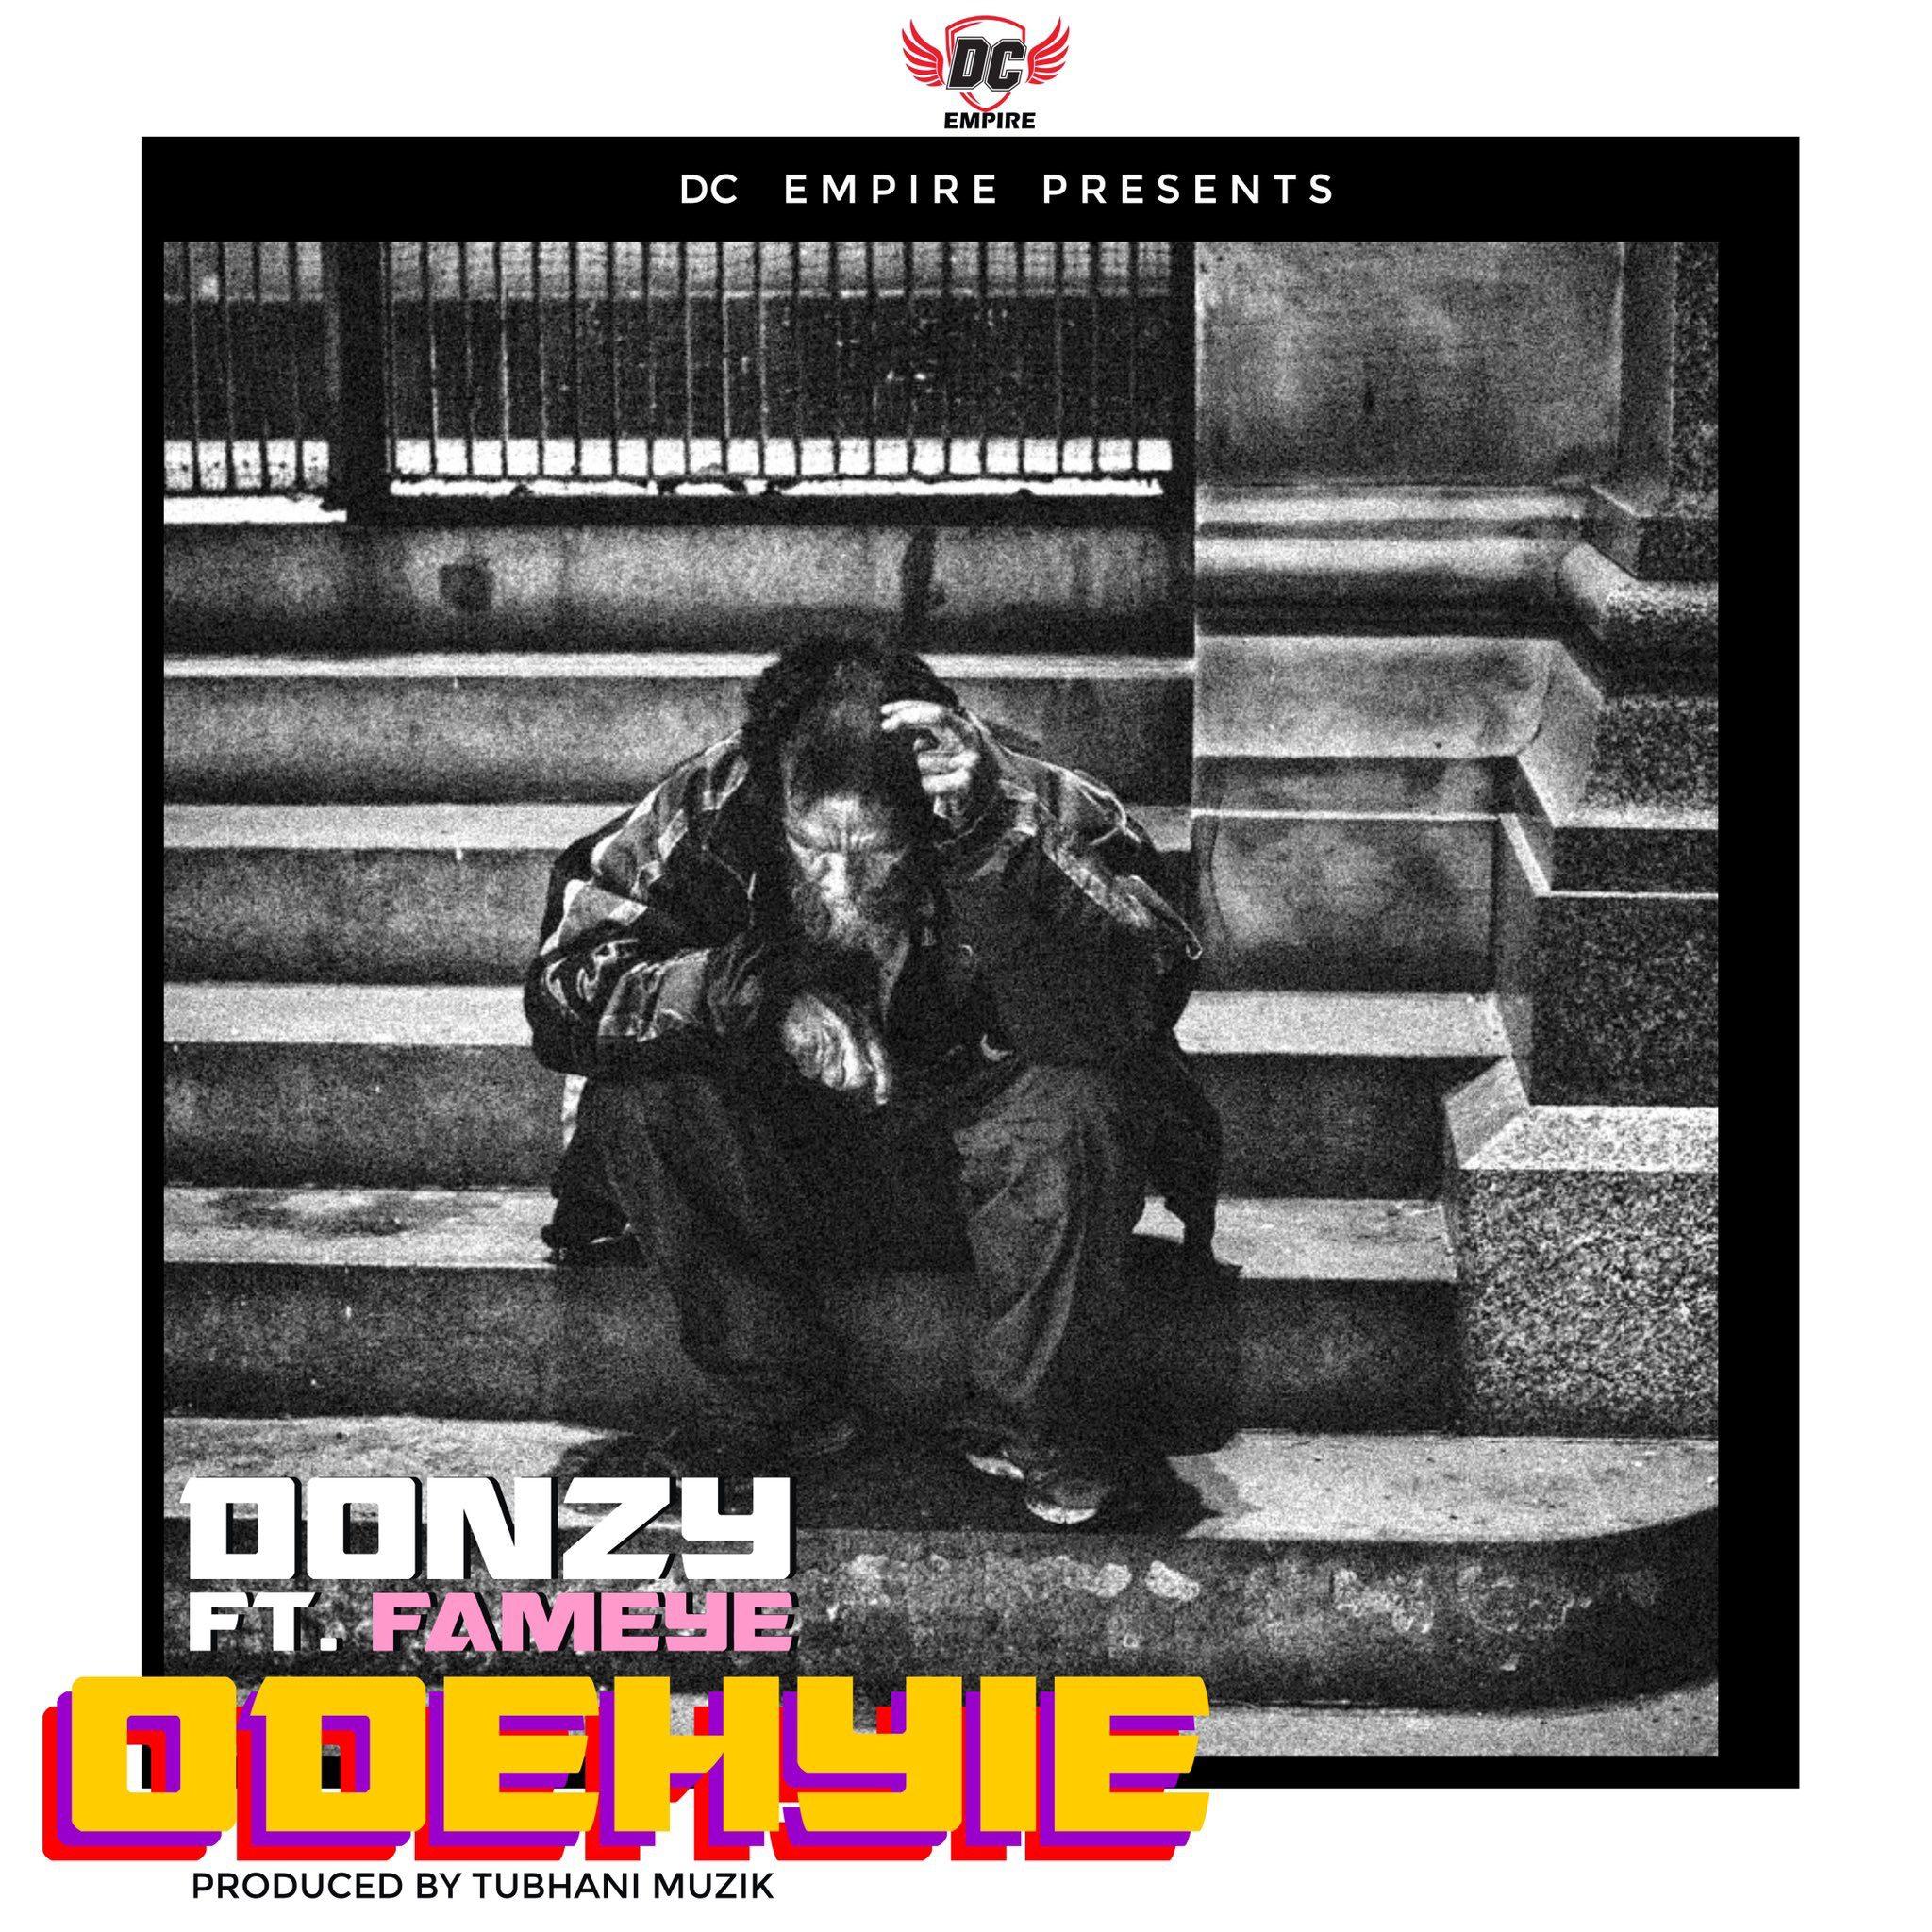 Donzy – Odehyie Ft Fameye (Prod. By Tubhani Muzik)